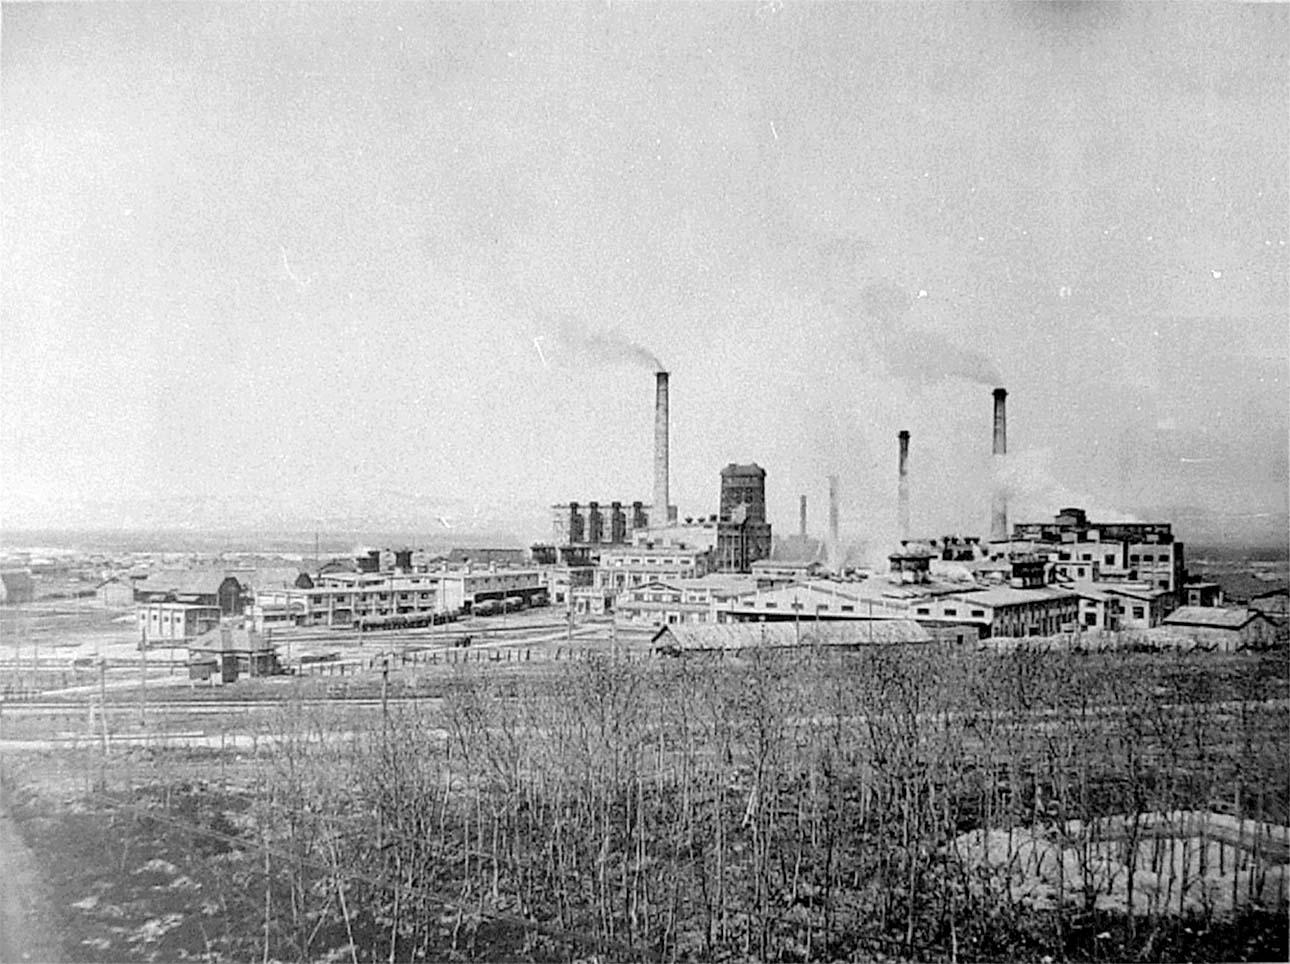 Dolinsk. Paper mill, circa 1930s